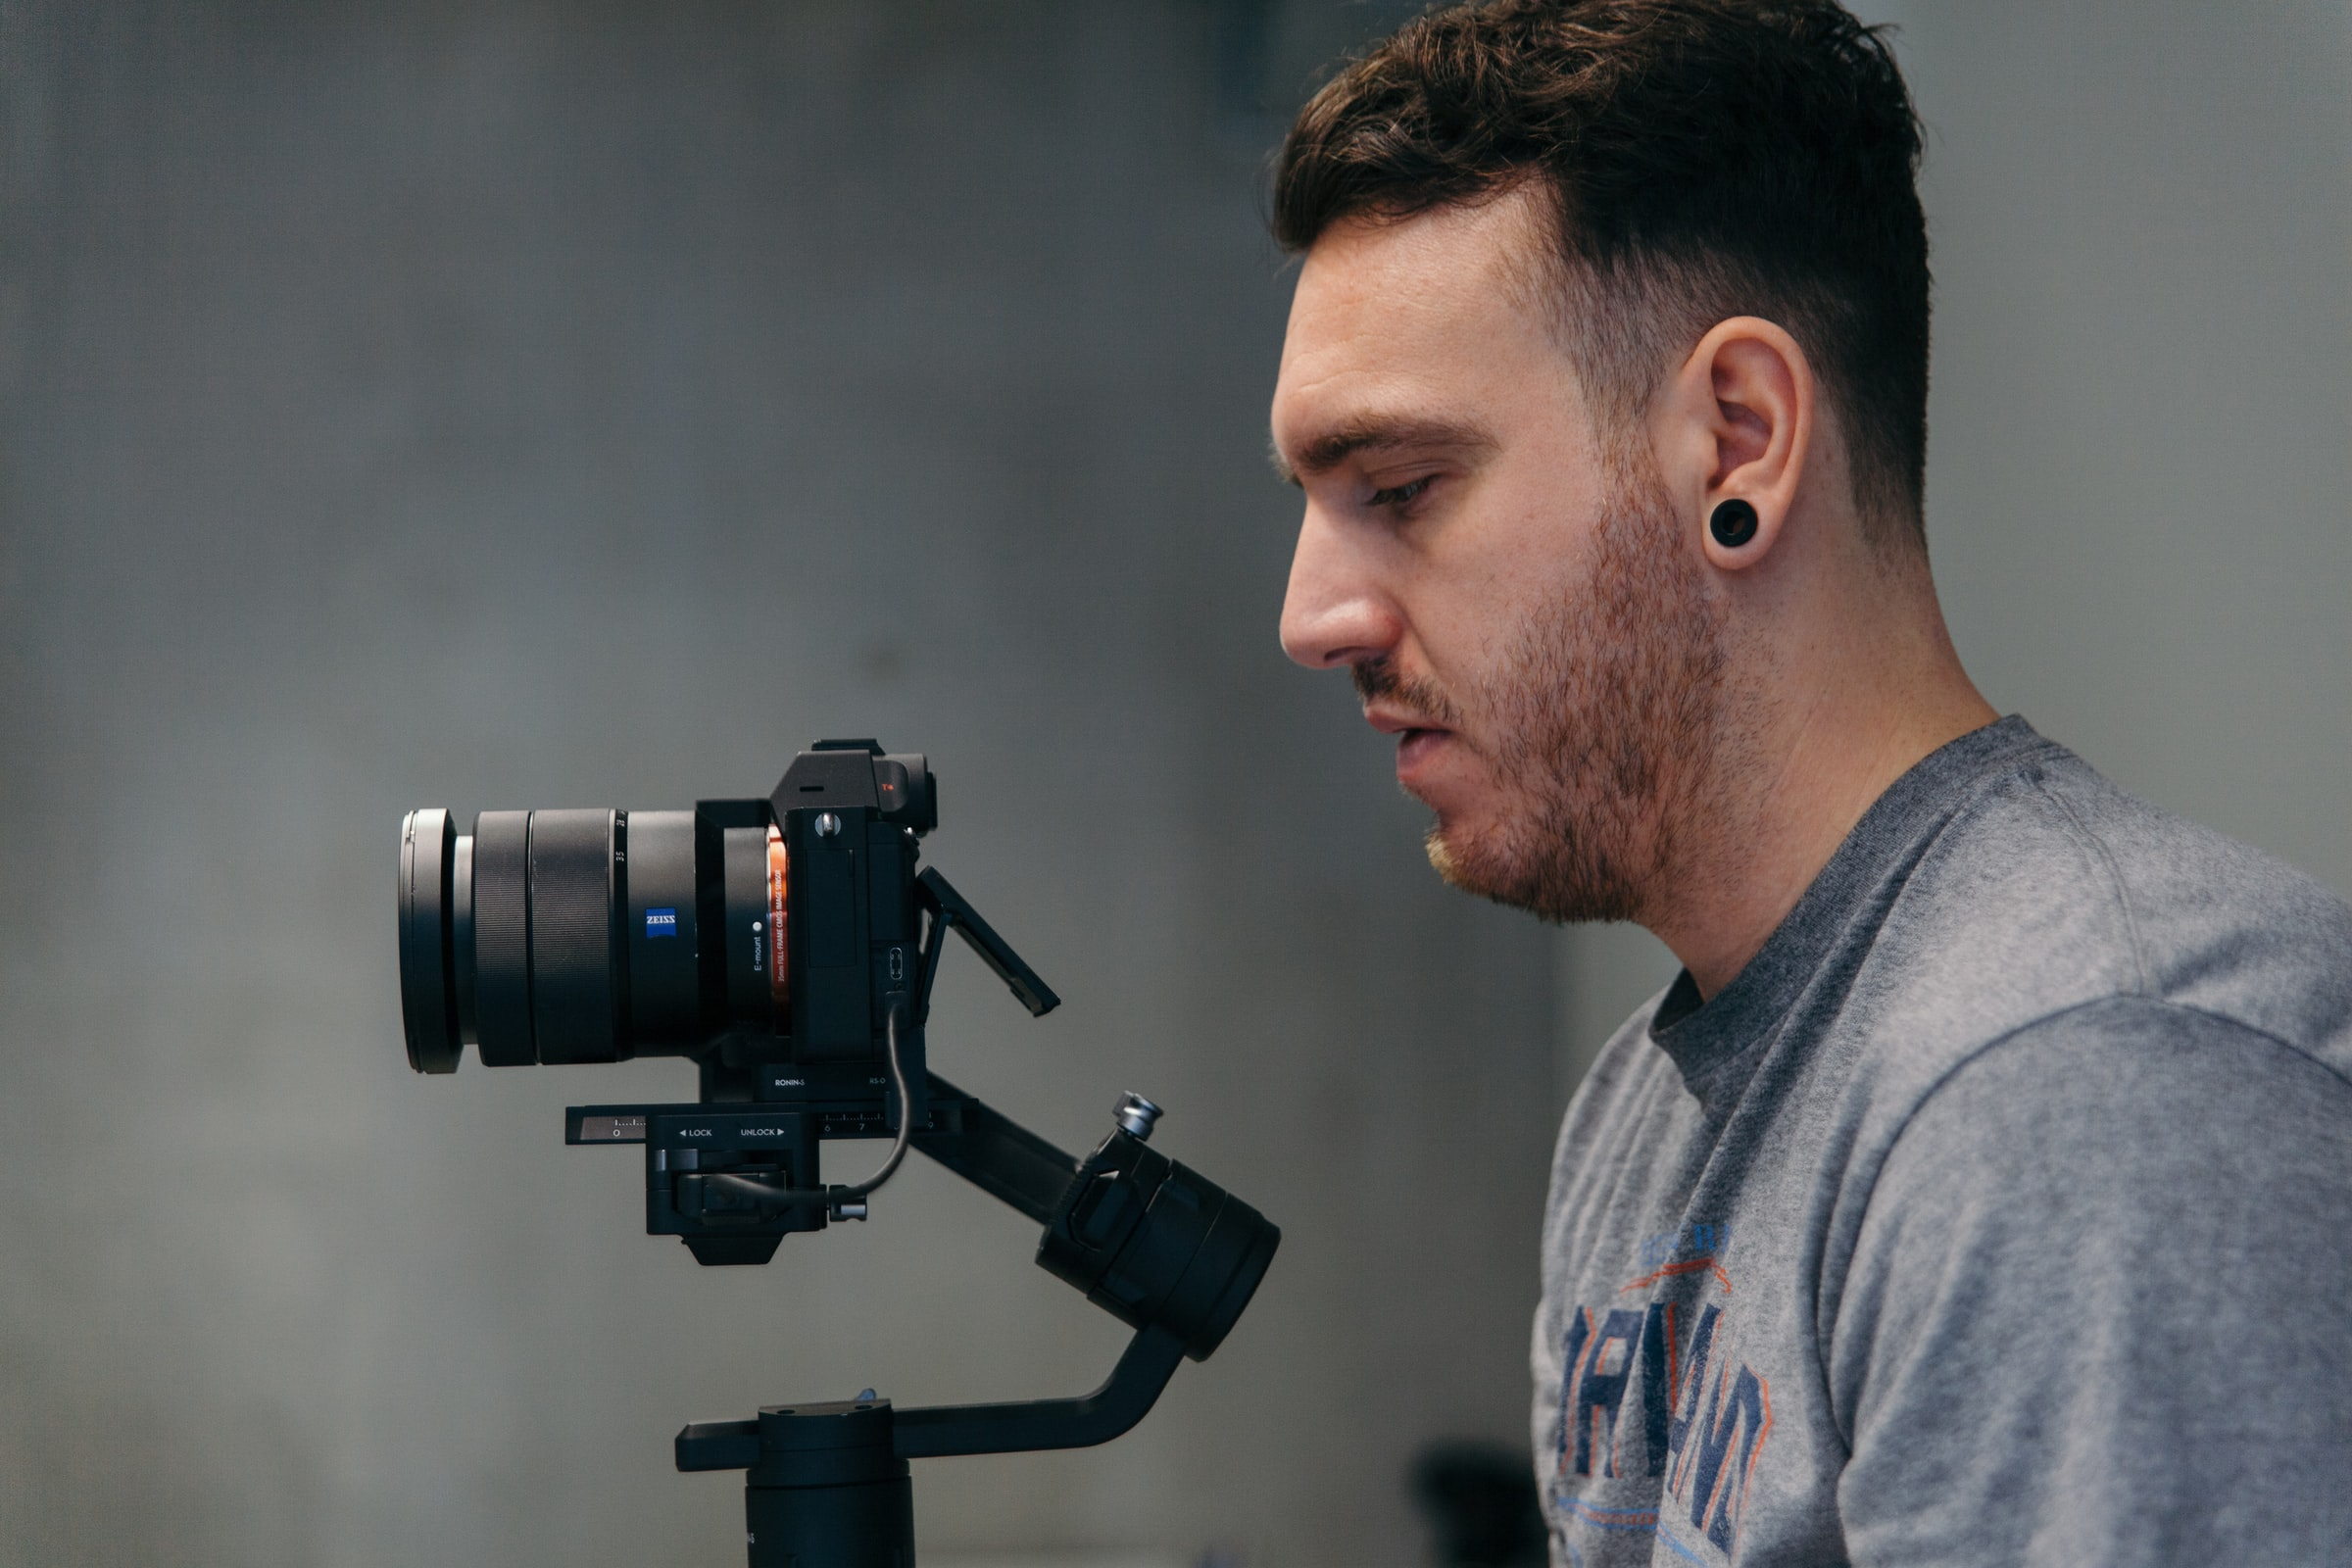 Filming Webinar